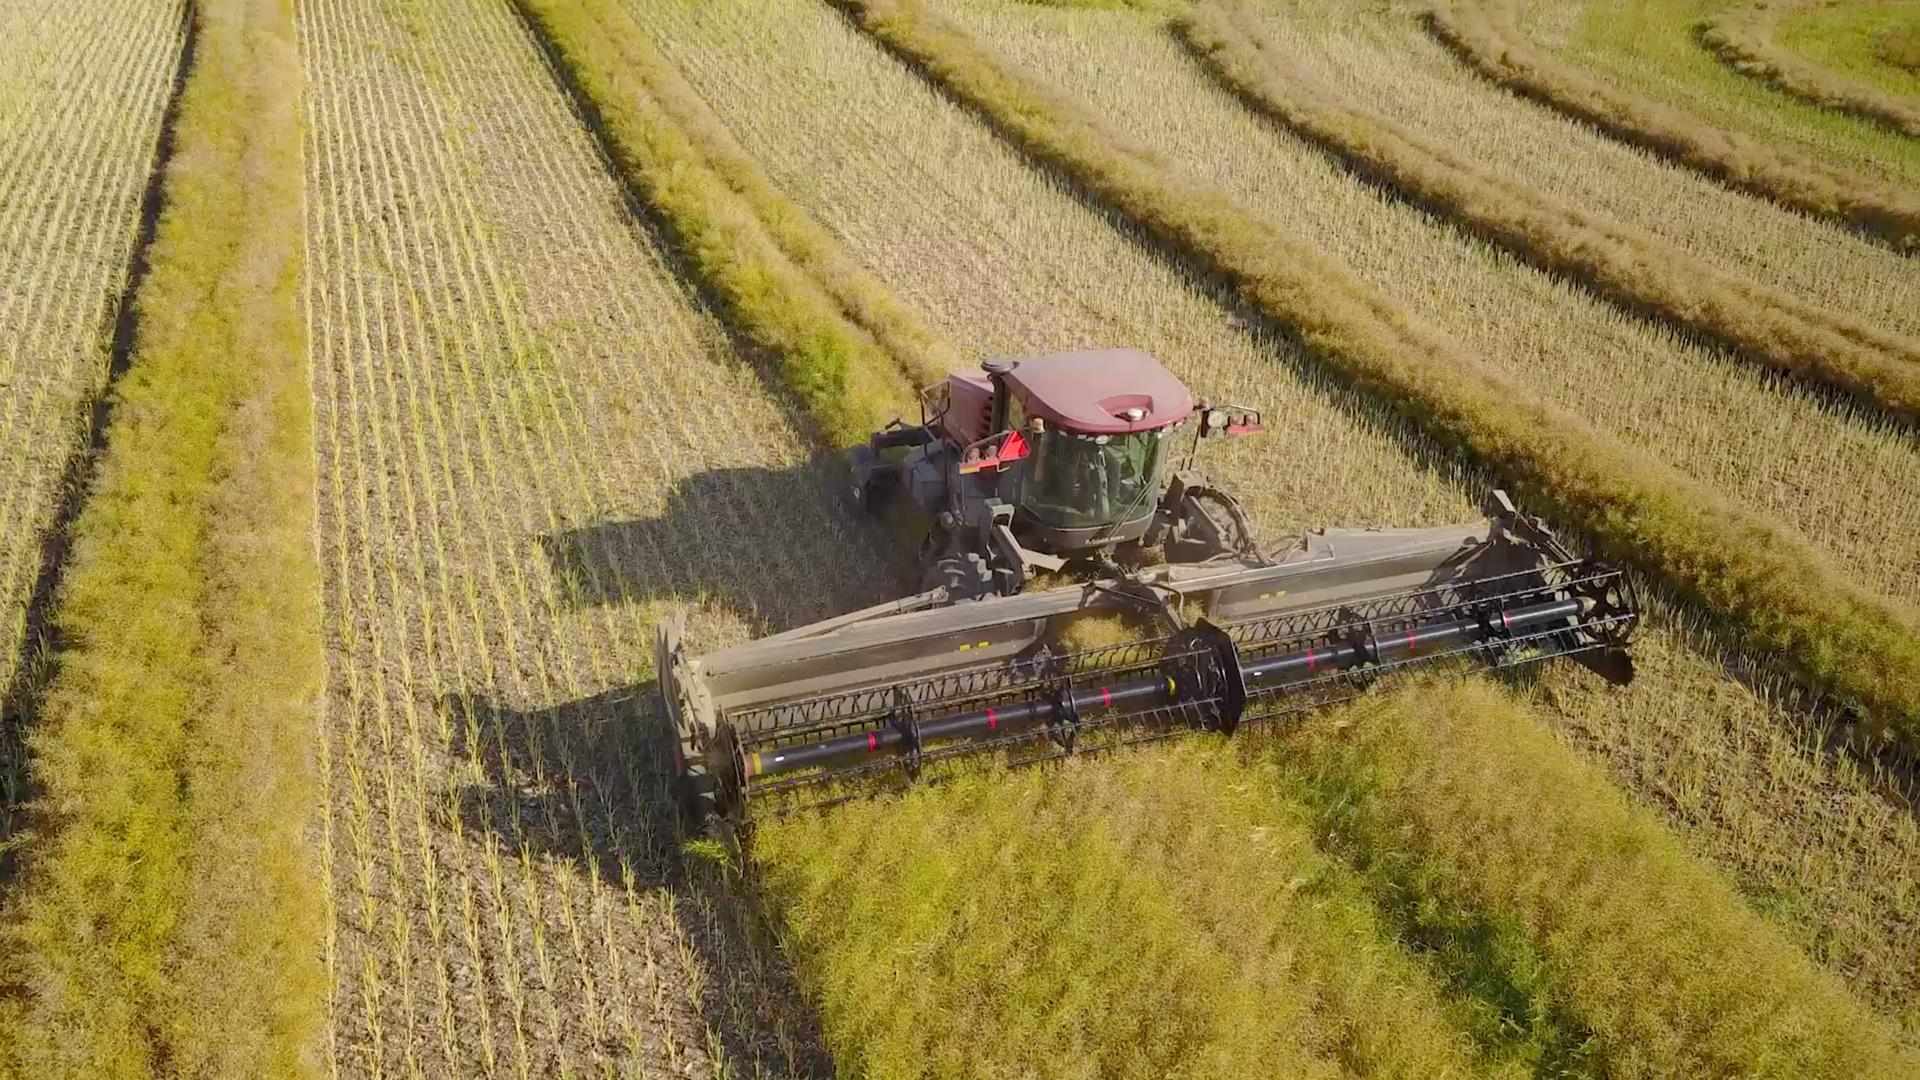 360˚ view of farm